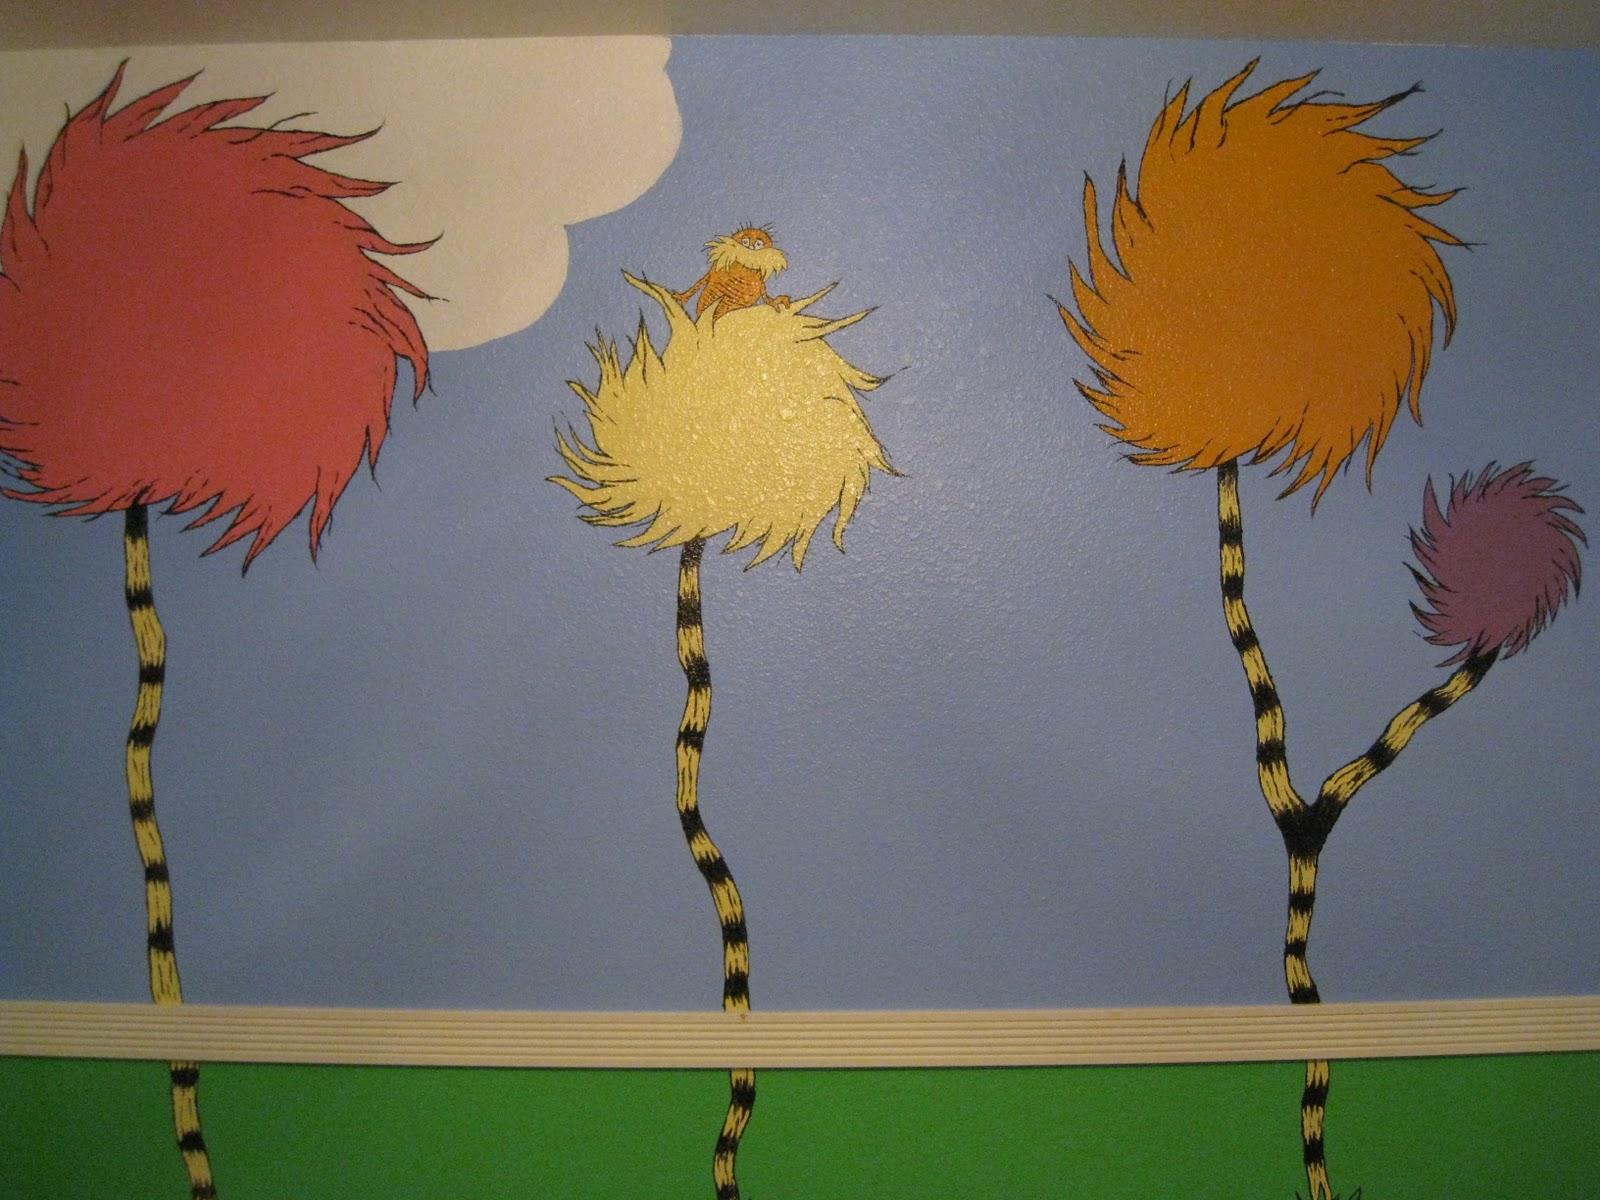 The reno sparks mom diy dr seuss lorax nursery mural for Dr seuss mural